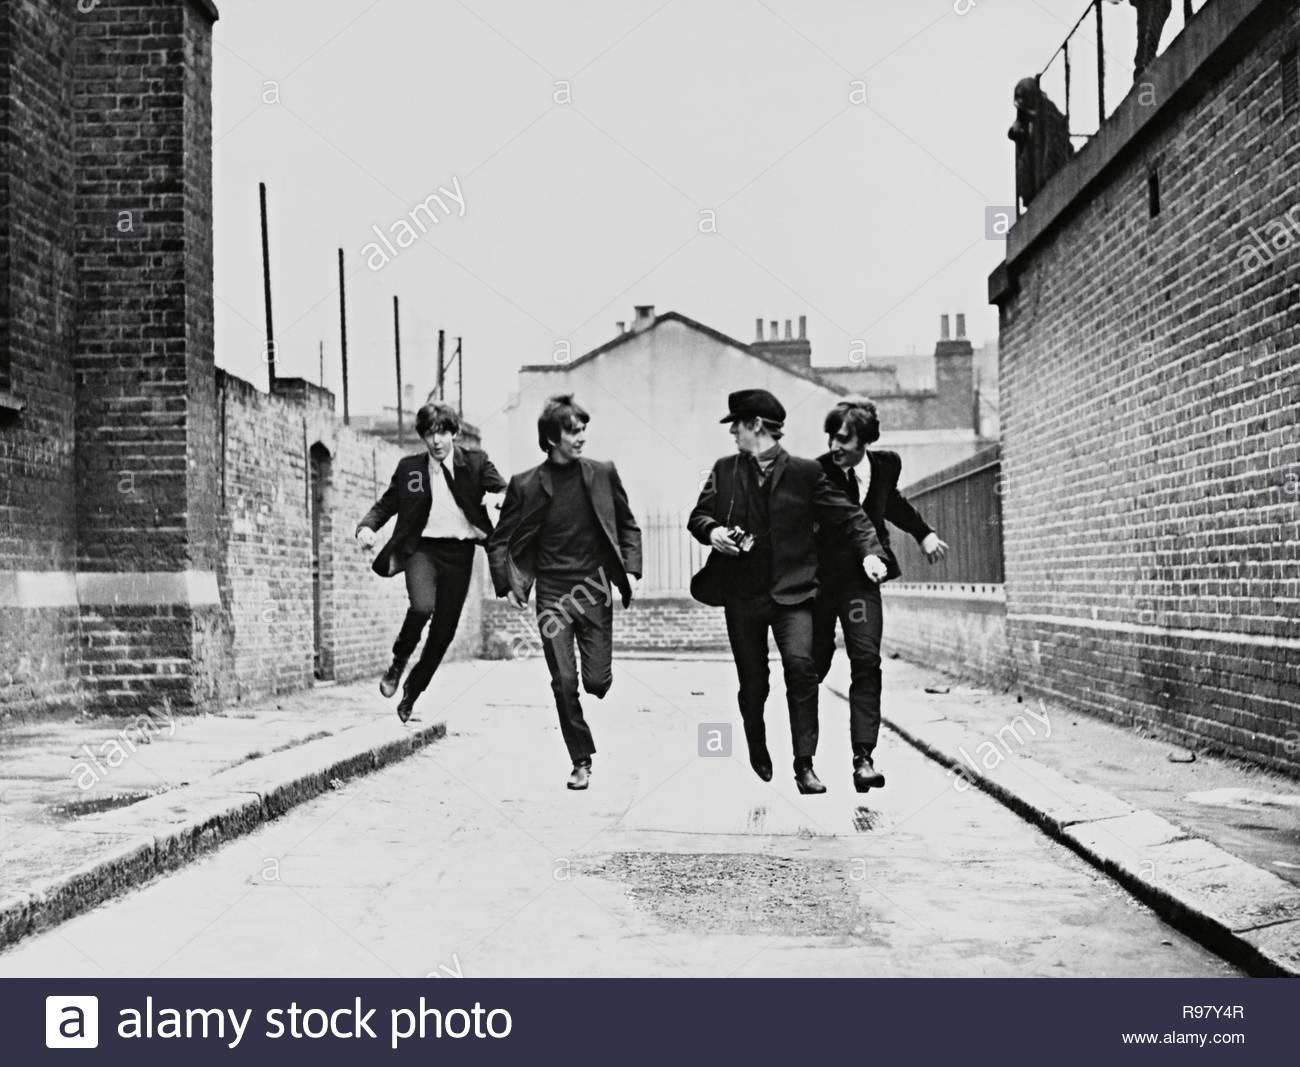 Original film title: A HARD DAY'S NIGHT. English title: A HARD DAY'S NIGHT. Year: 1964. Director: RICHARD LESTER. Stars: THE BEATLES; RINGO STARR; GEORGE HARRISON; PAUL MCCARTNEY; JOHN LENNON. Credit: UNITED ARTISTS / Album - Stock Image